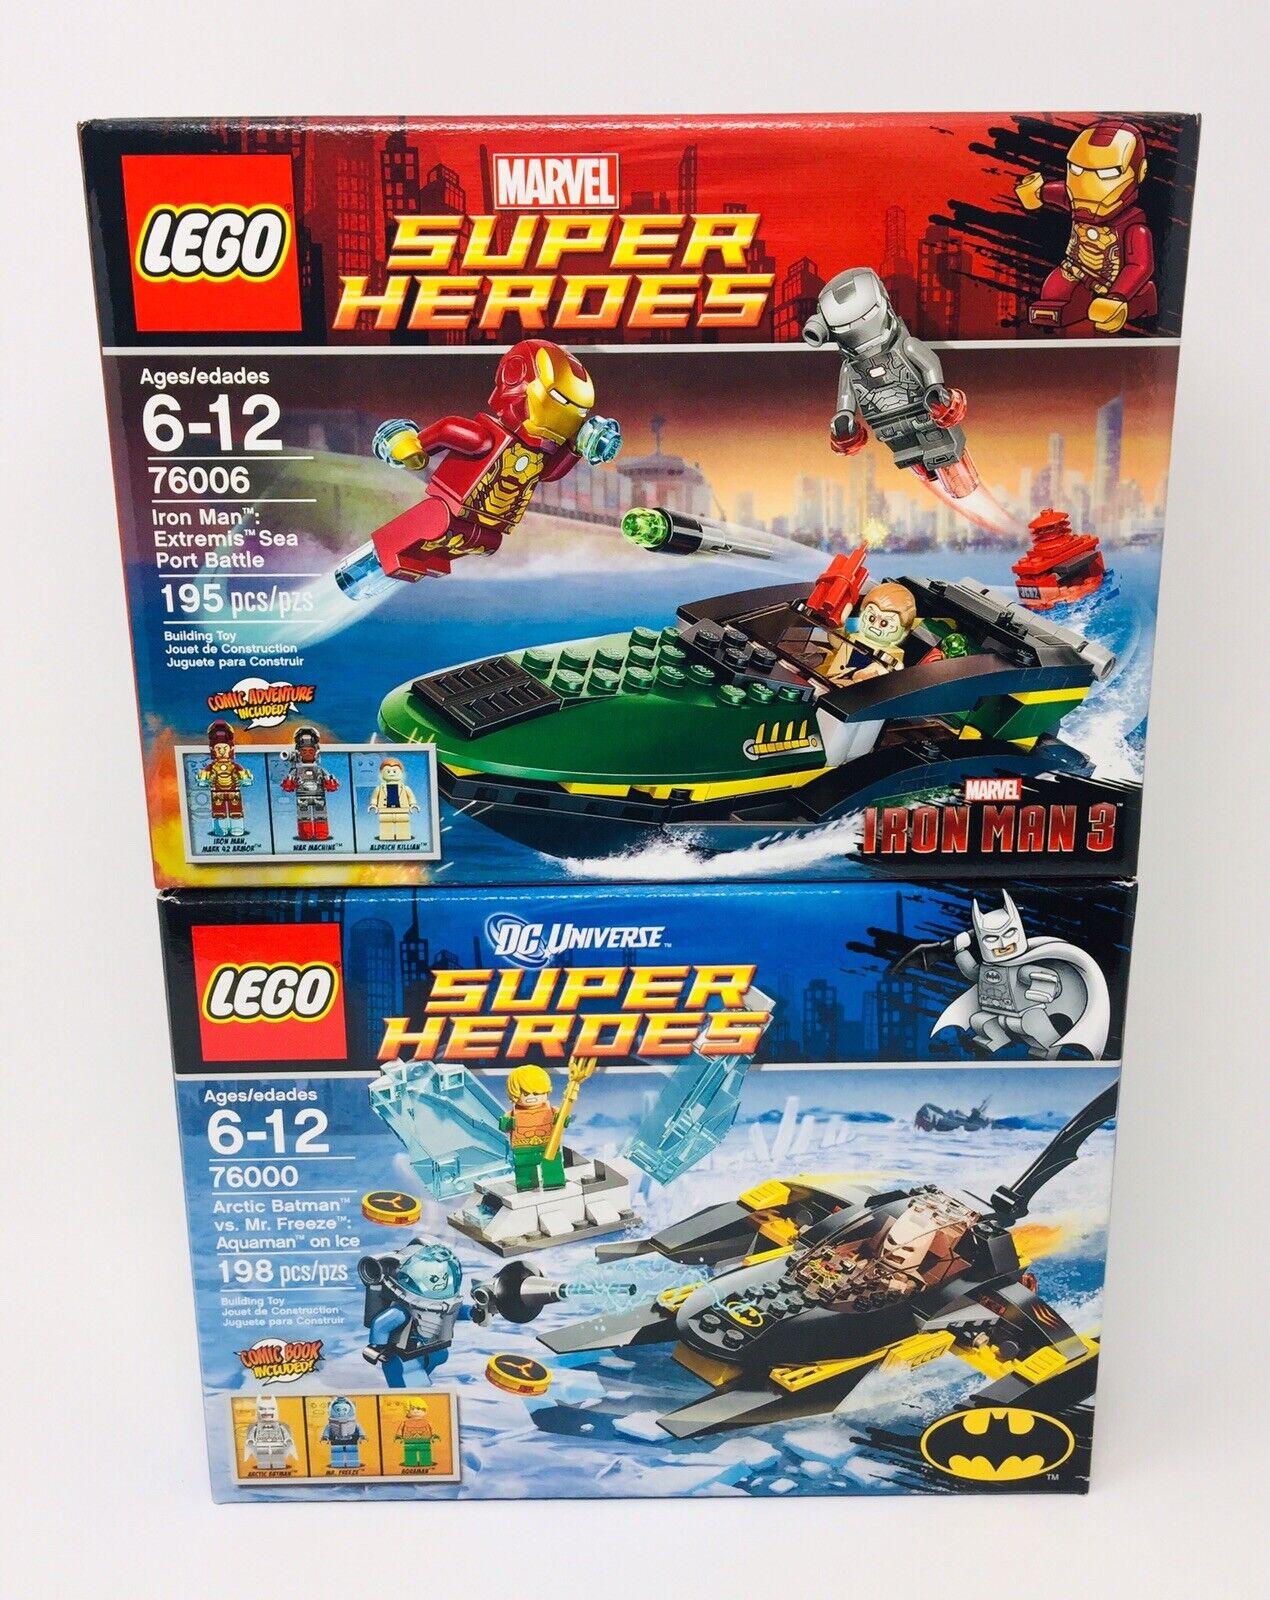 (2) Brand New Lego förundras DC Super Heroes Lot 76000 76006 Extremis Arktis